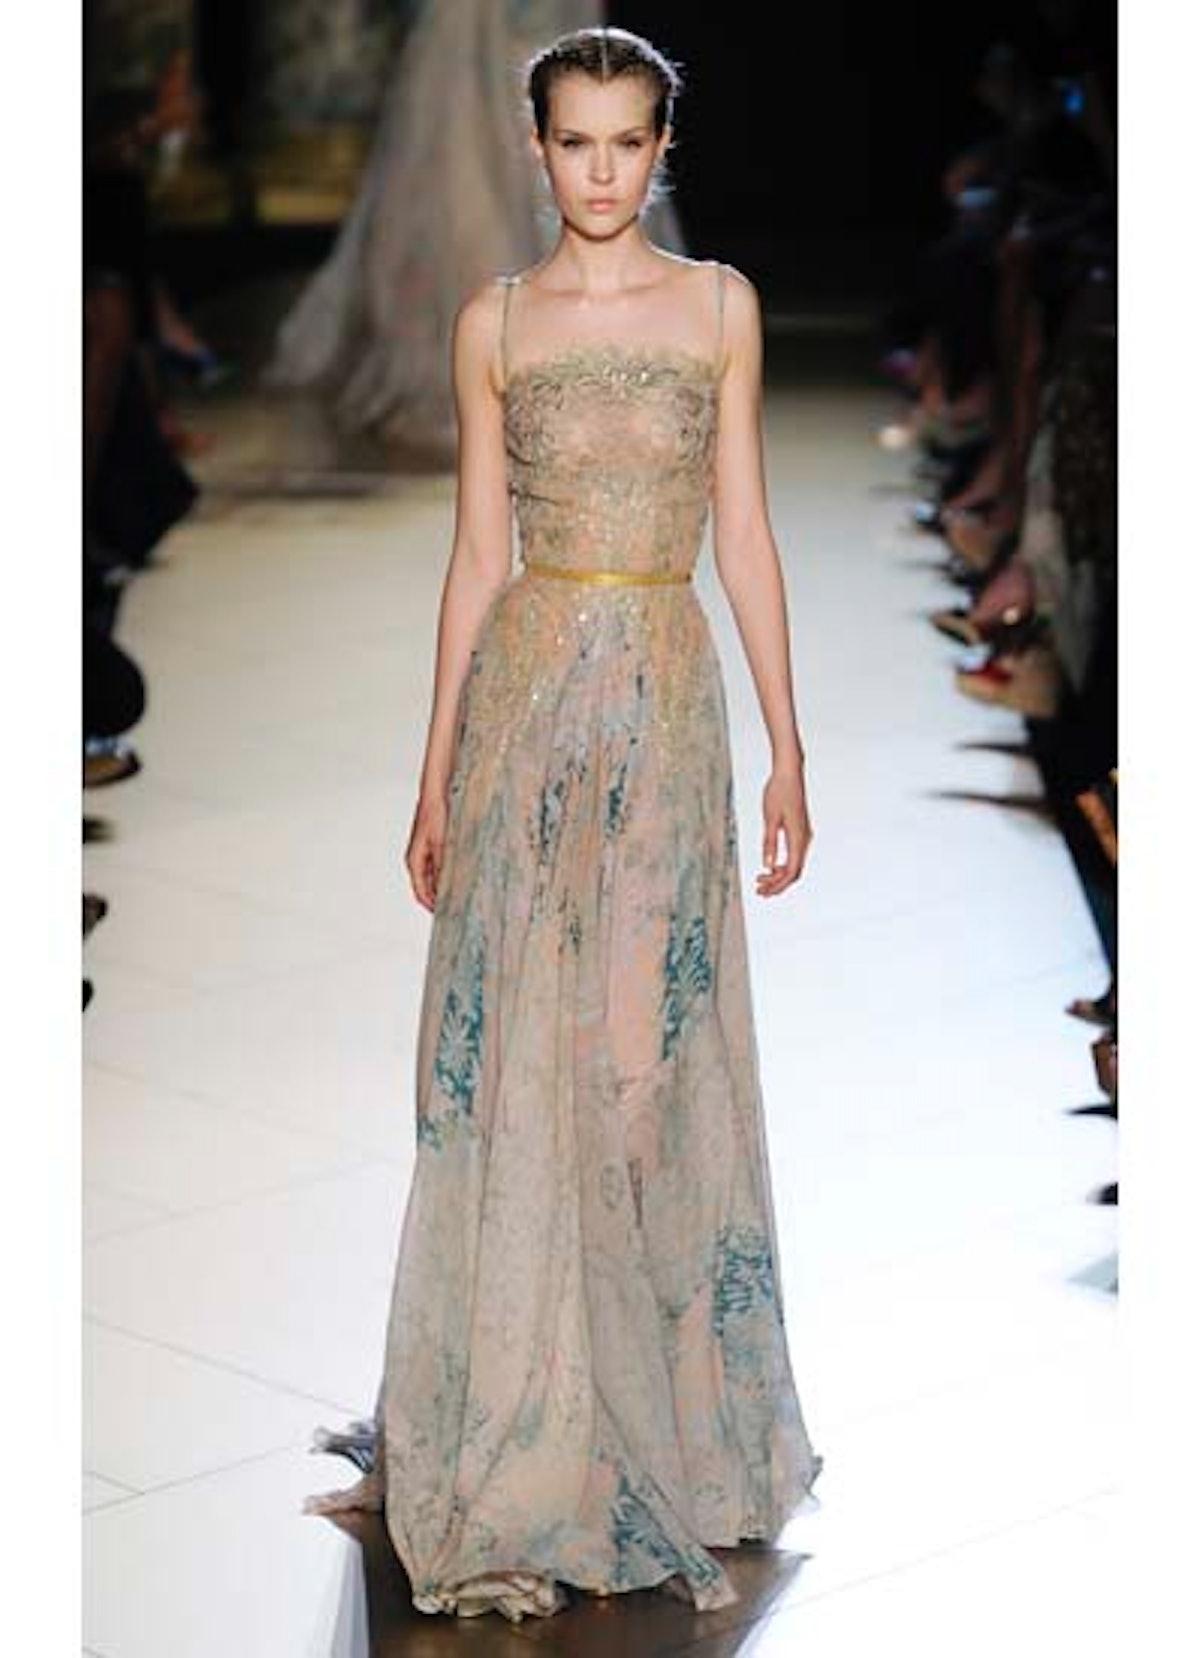 fass-elie-saab-couture-2012-runway-30-v.jpg